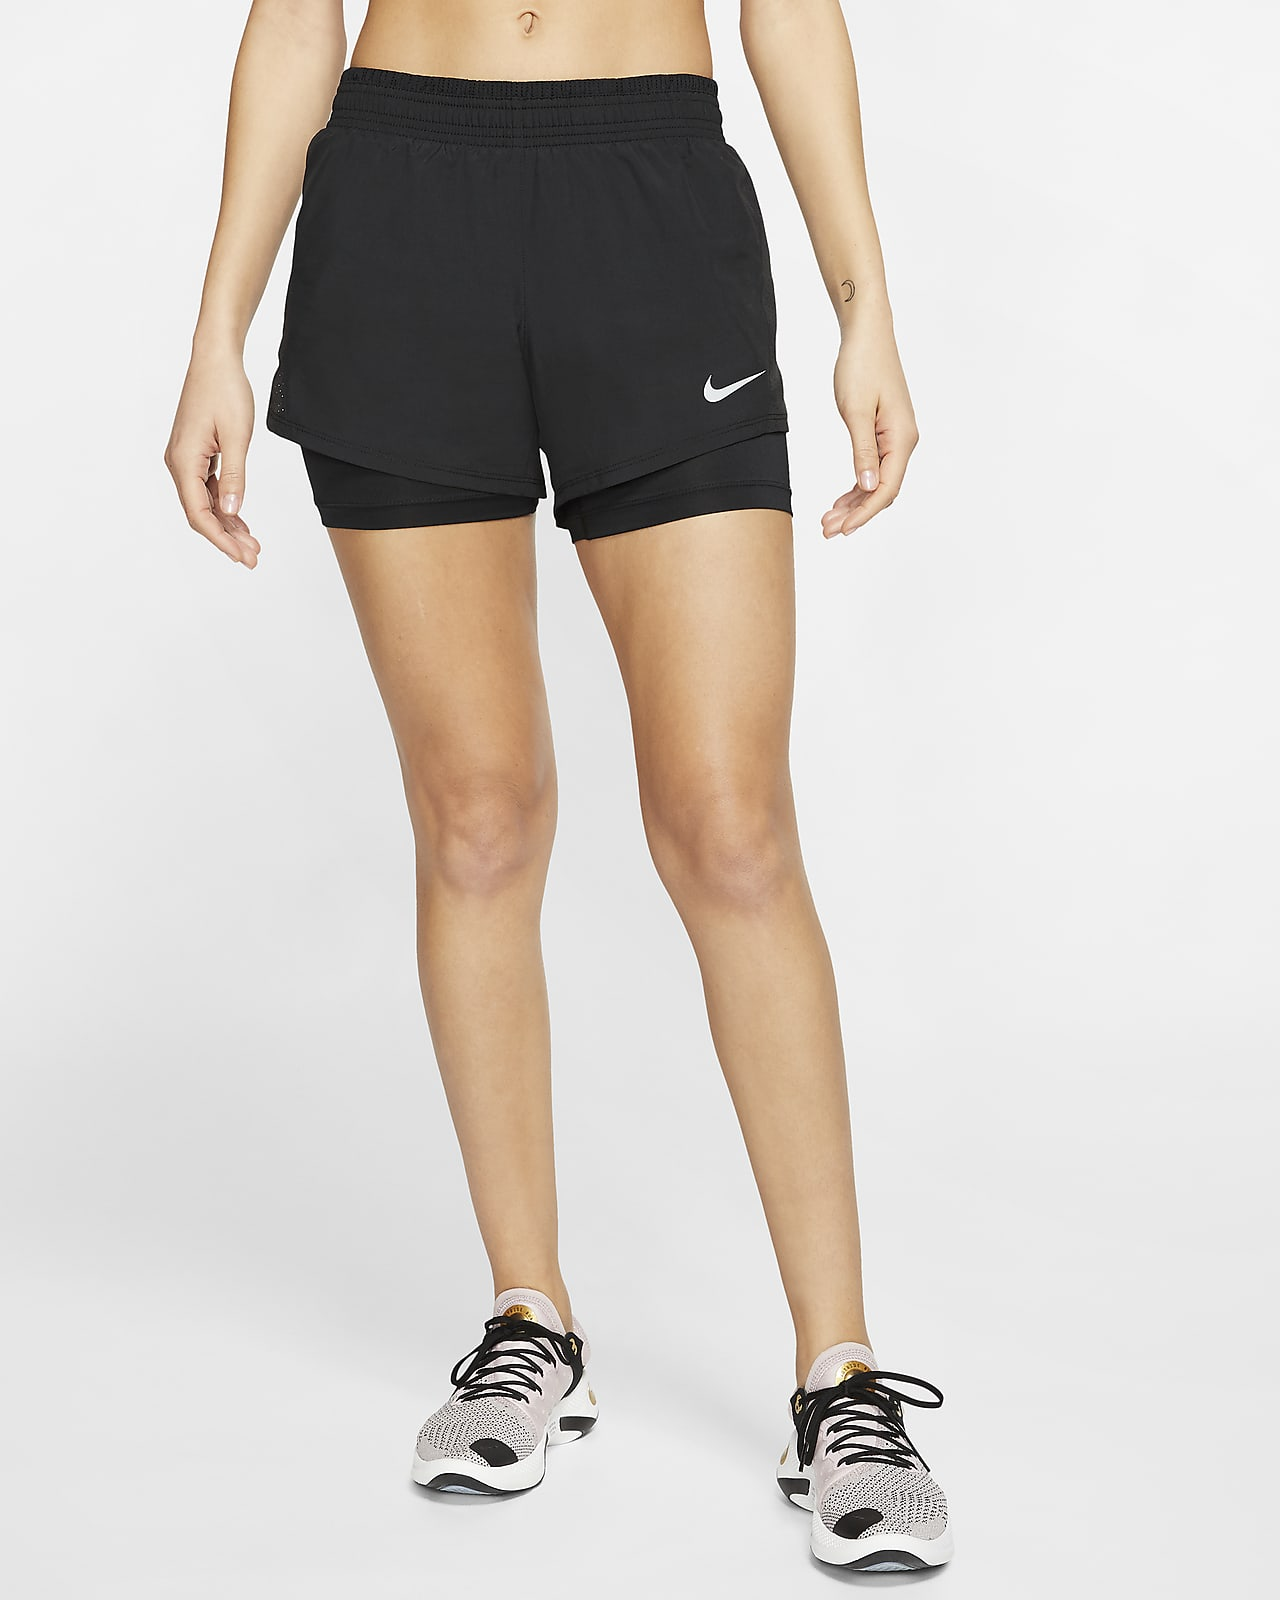 Nike Women's 2-In-1 Running Shorts